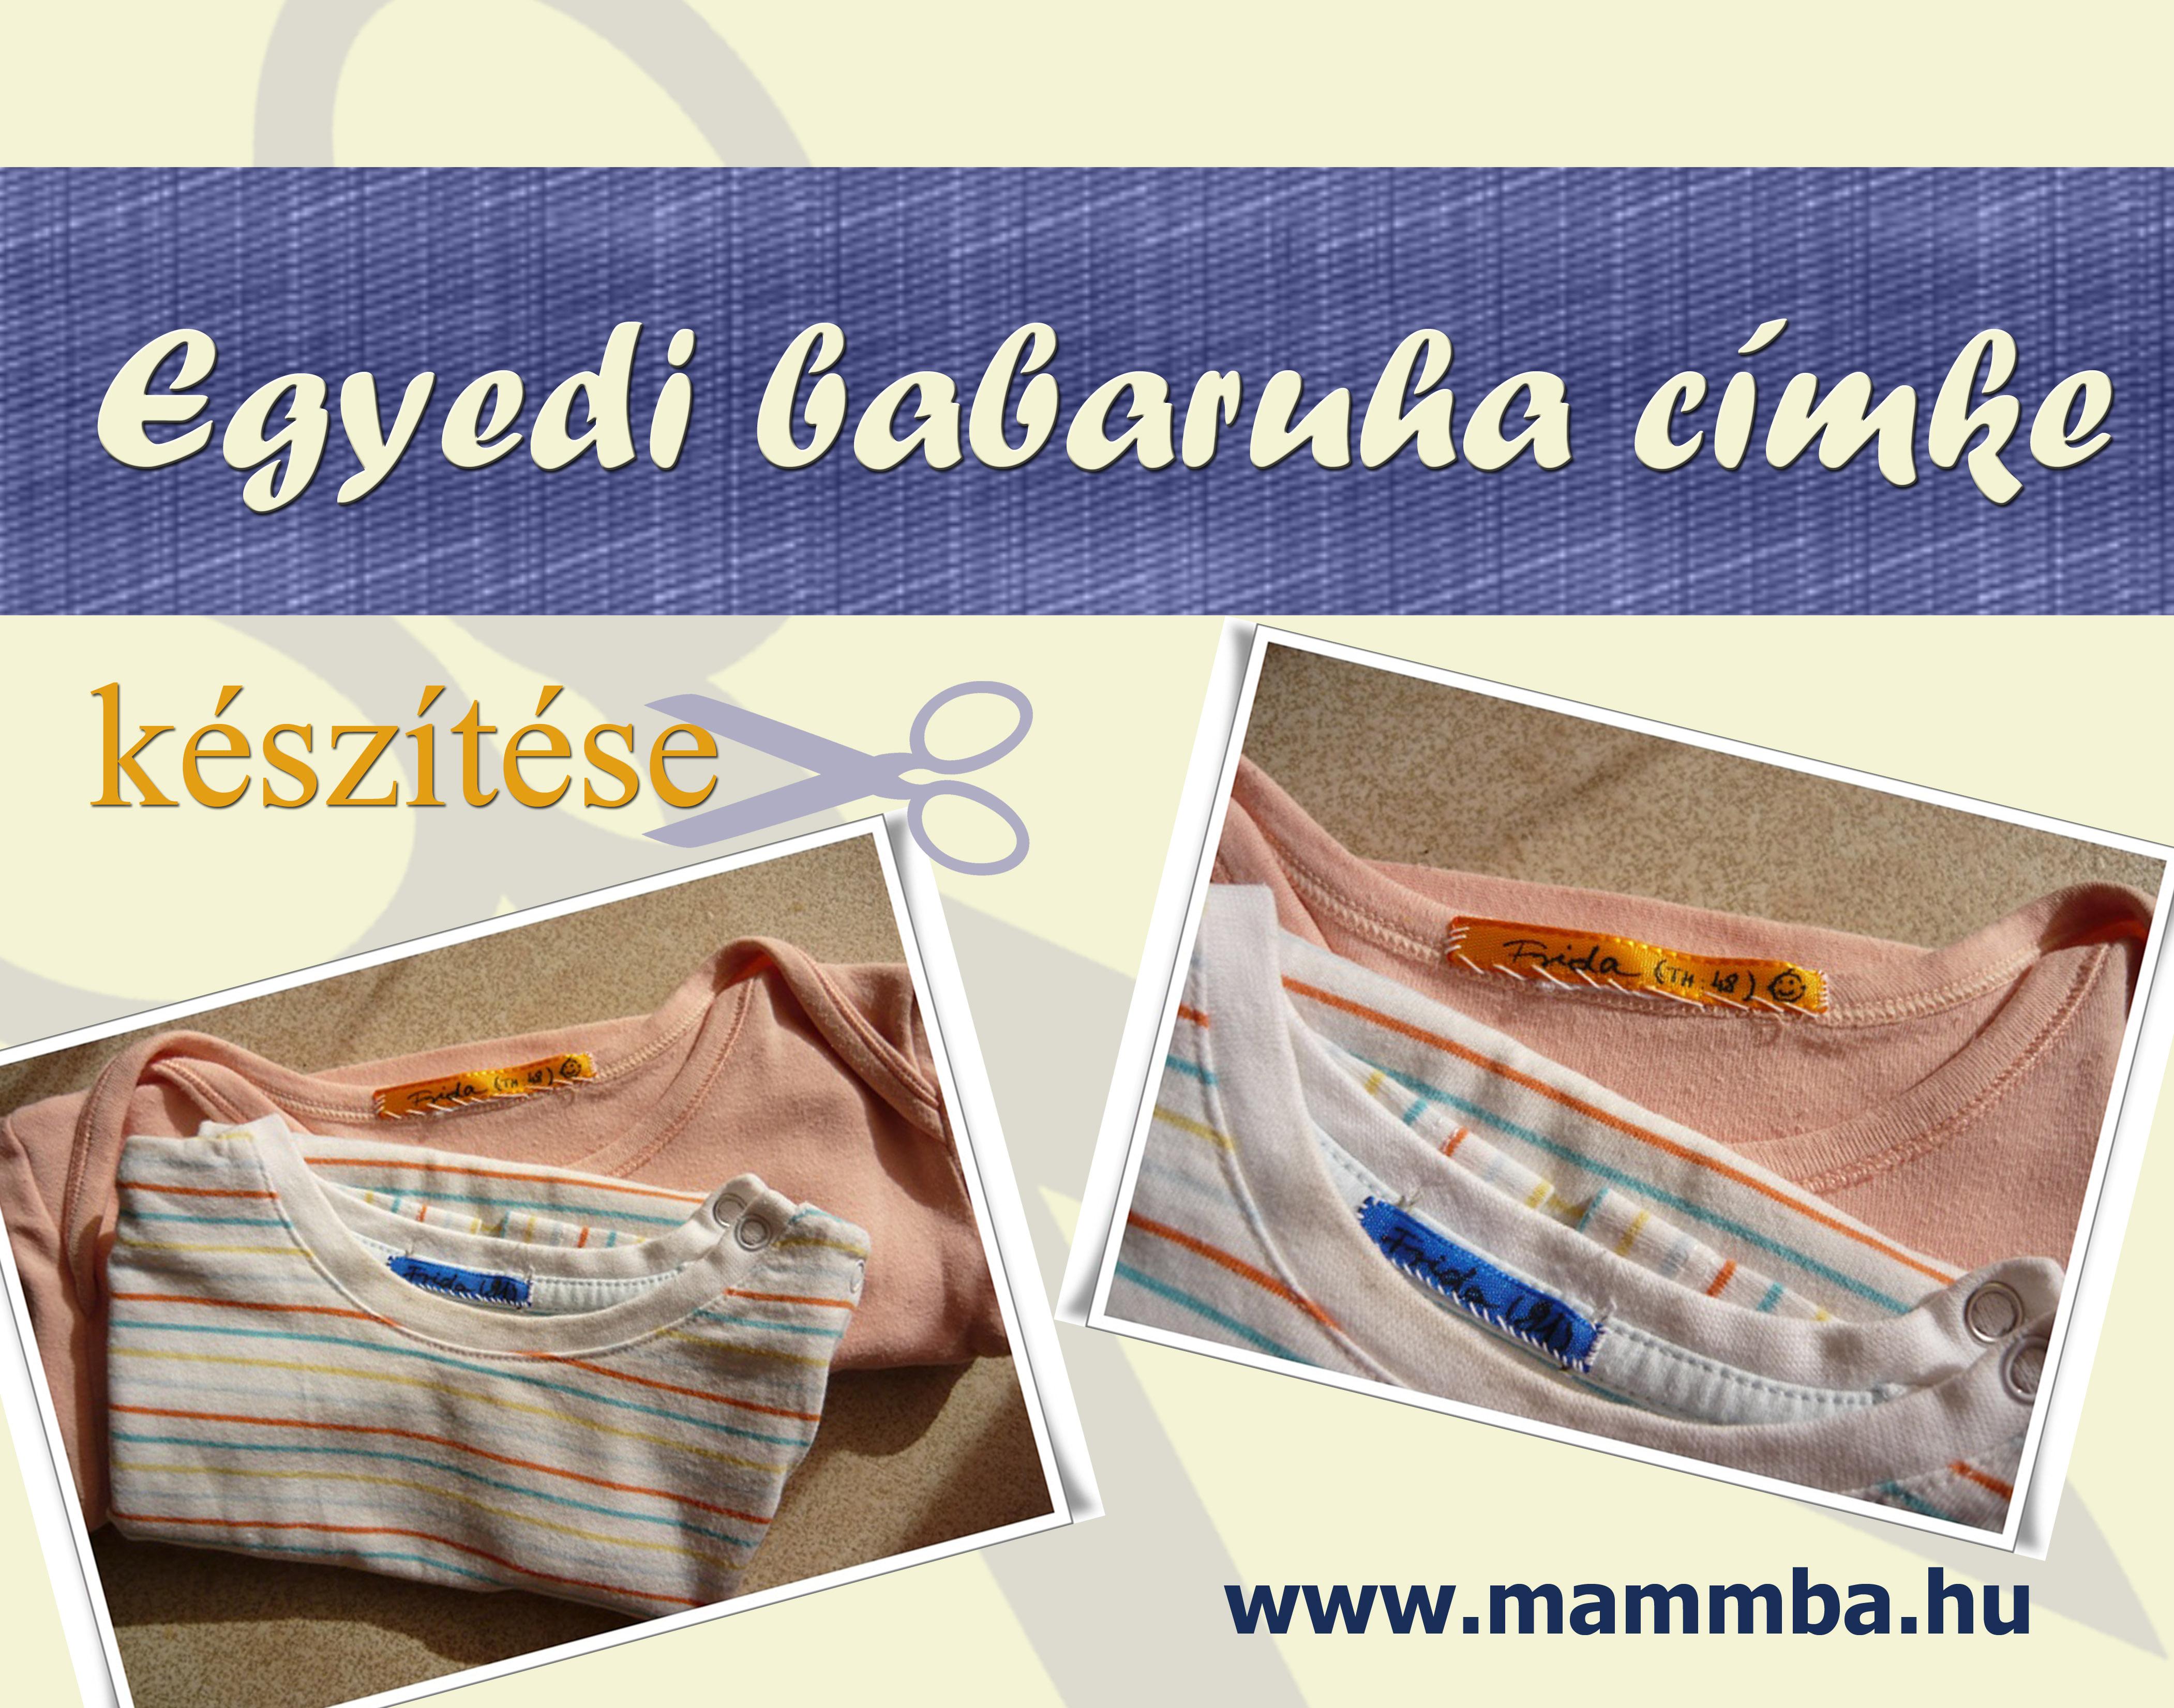 Egyedi babaruha címke  c5b0972e62